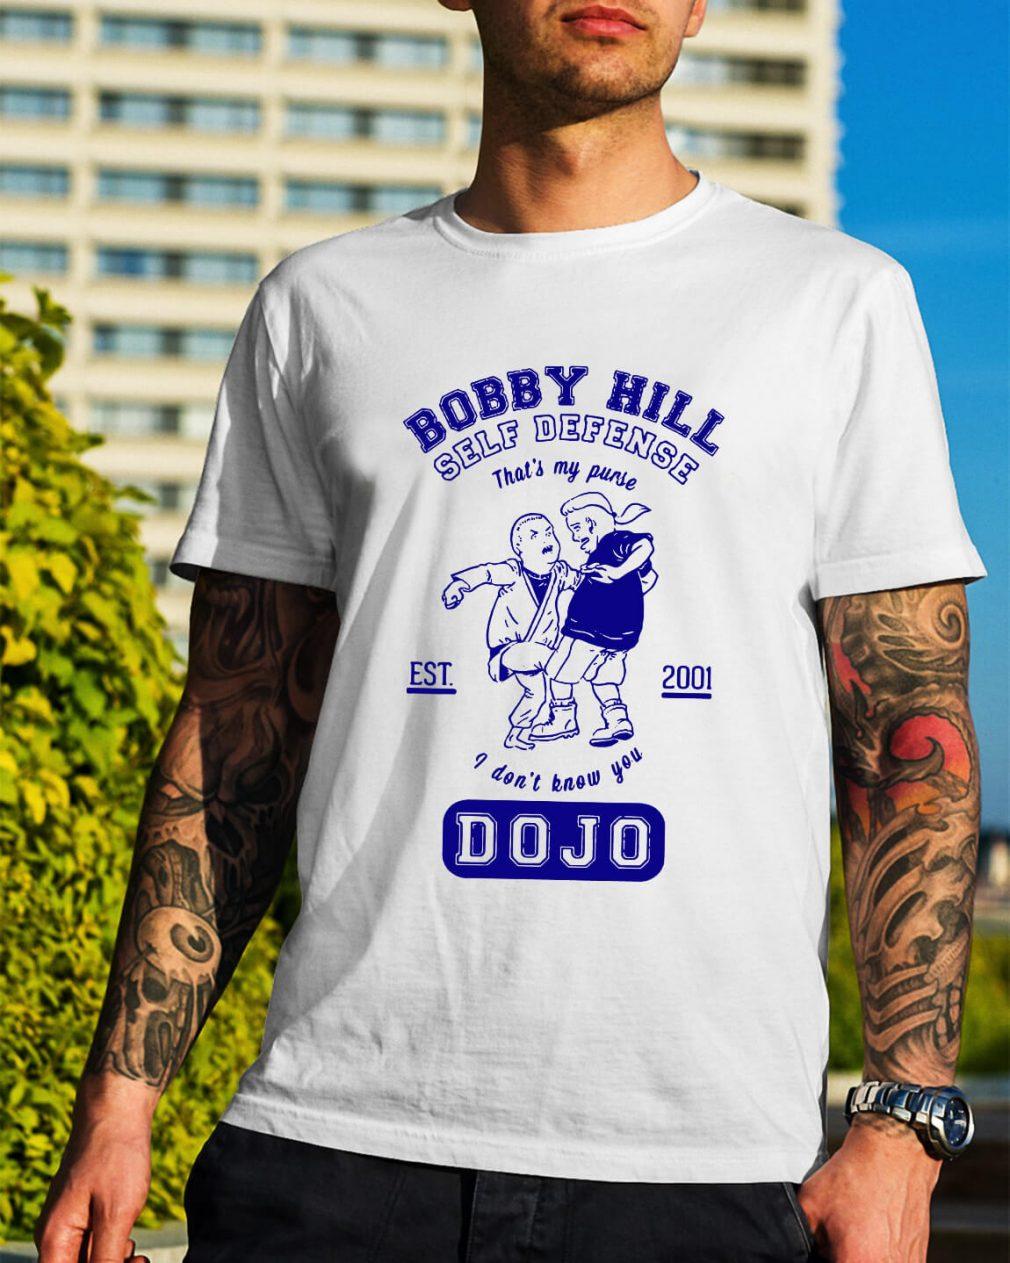 Bobby hill self defense Dojo shirt